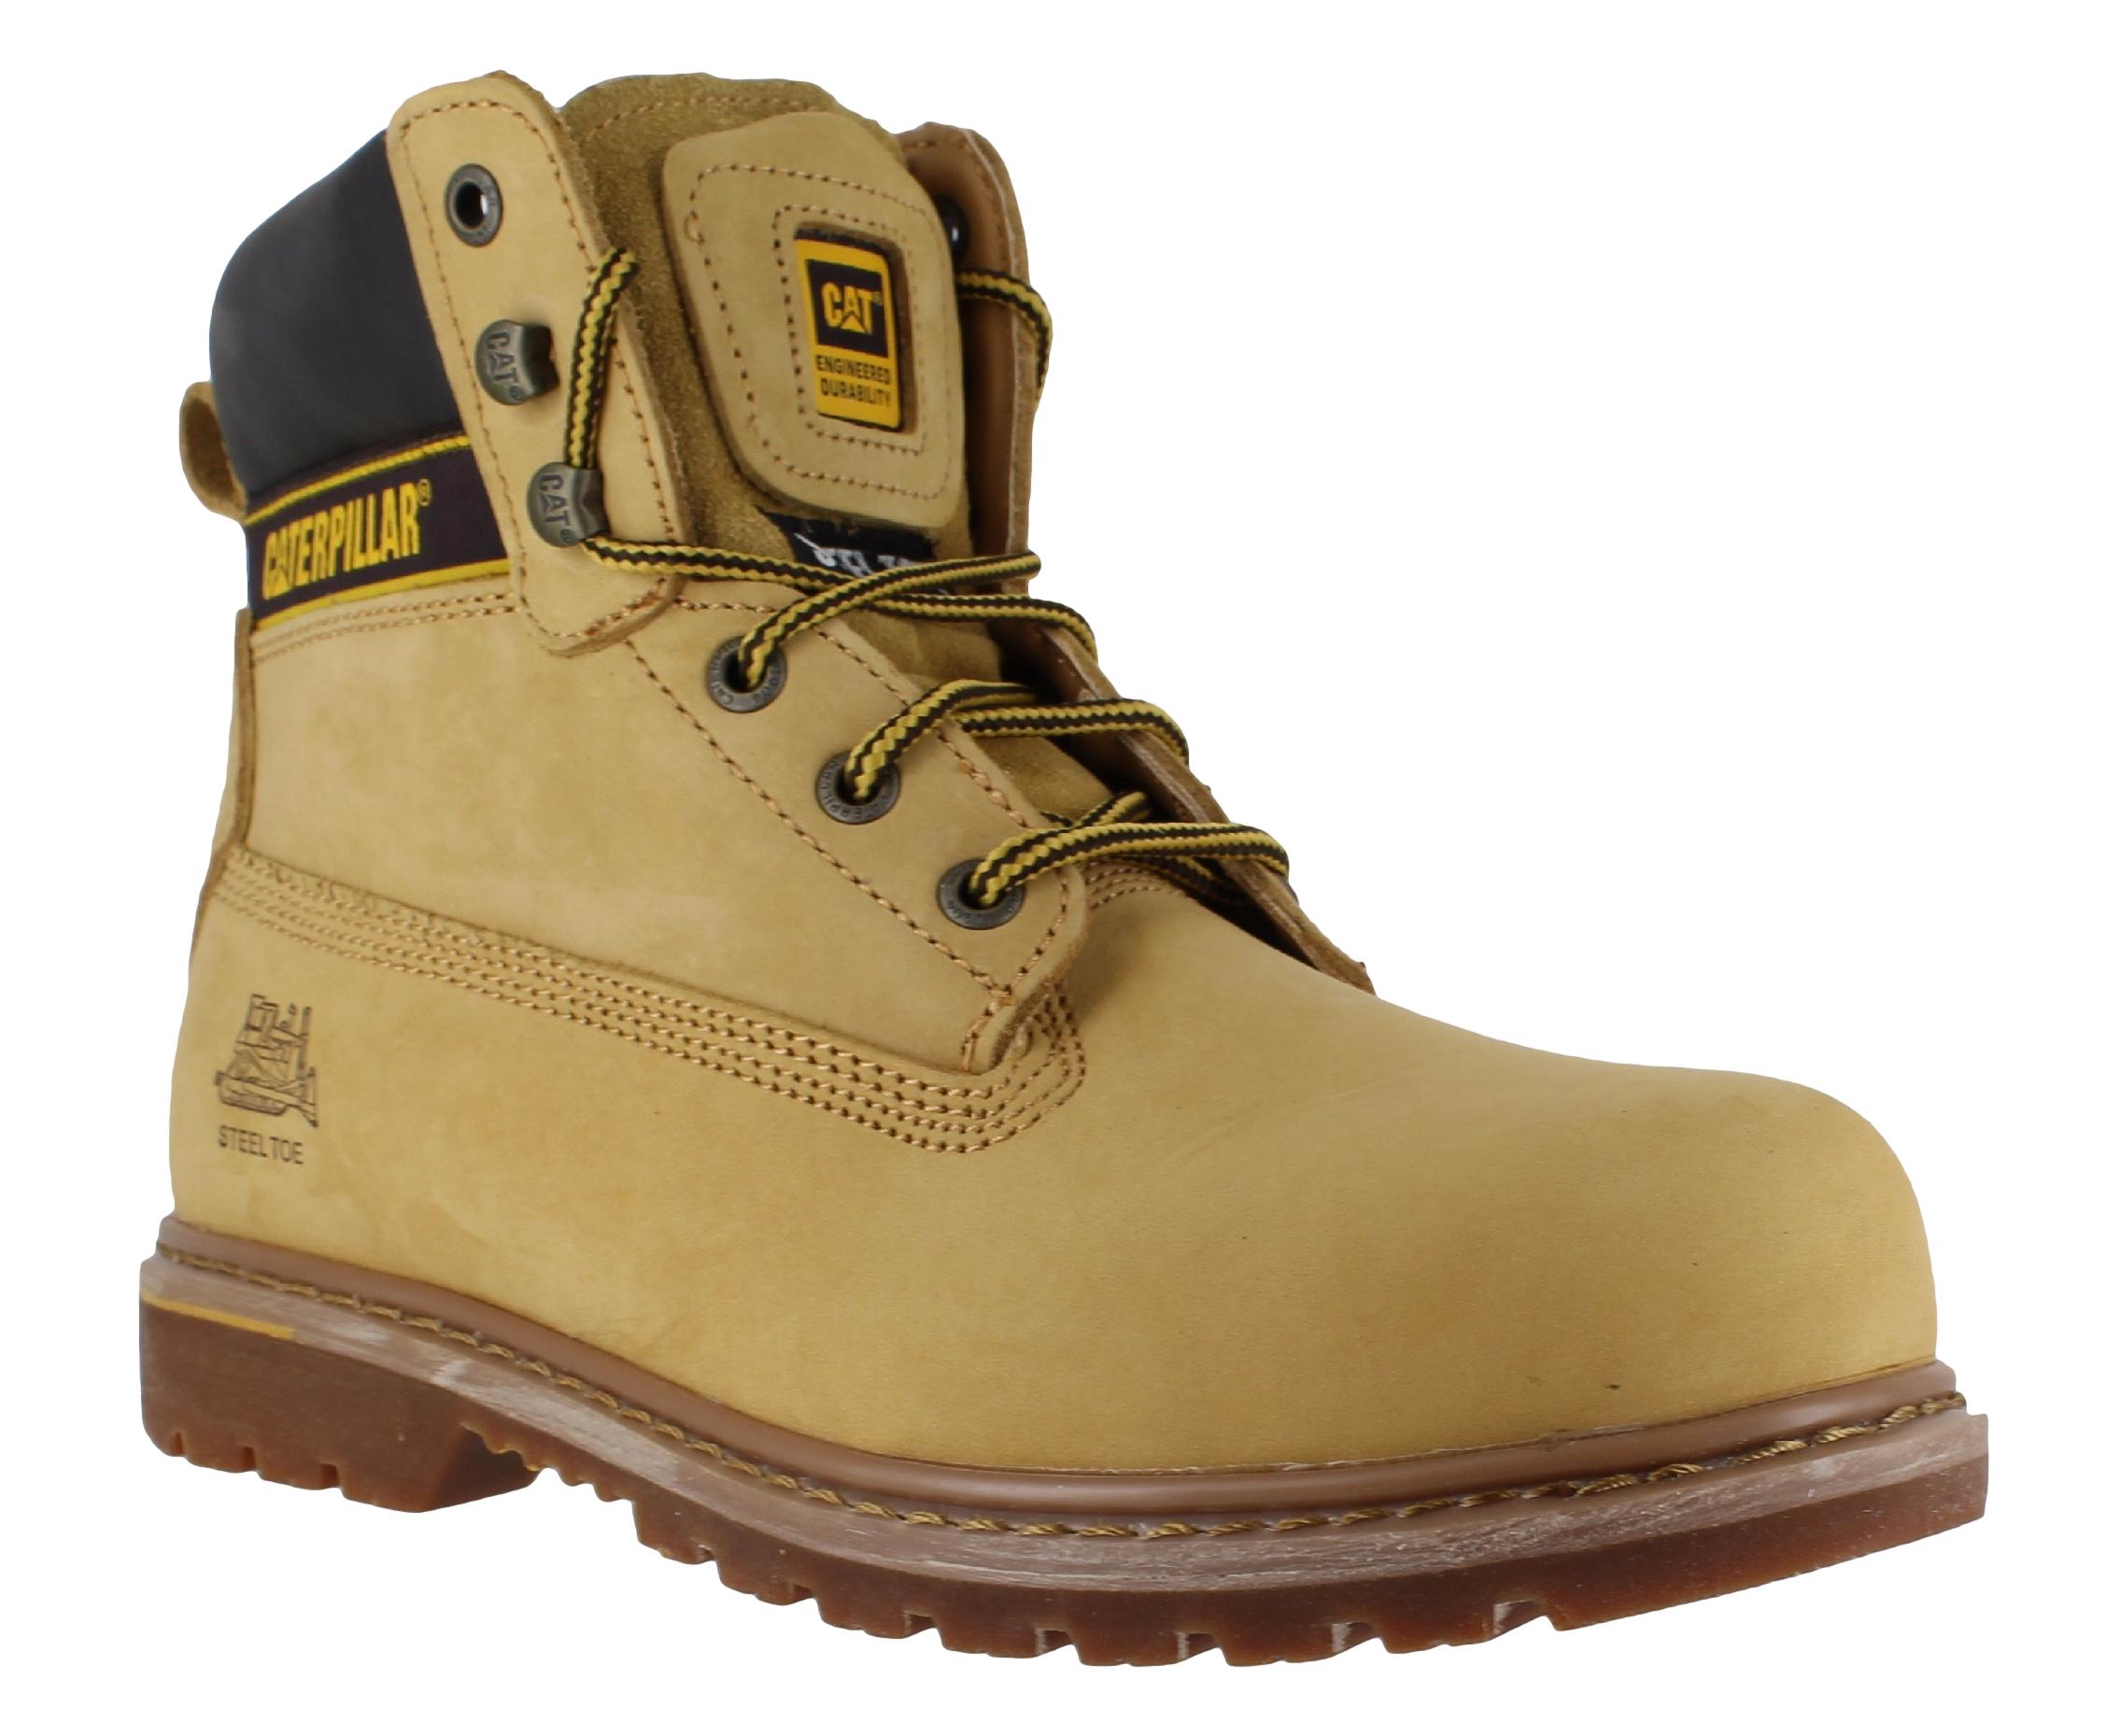 998259597aae Caterpillar Holton Mens Miele   Giallo SB di sicurezza in acciaio Puntale  Lace Up Work Boots